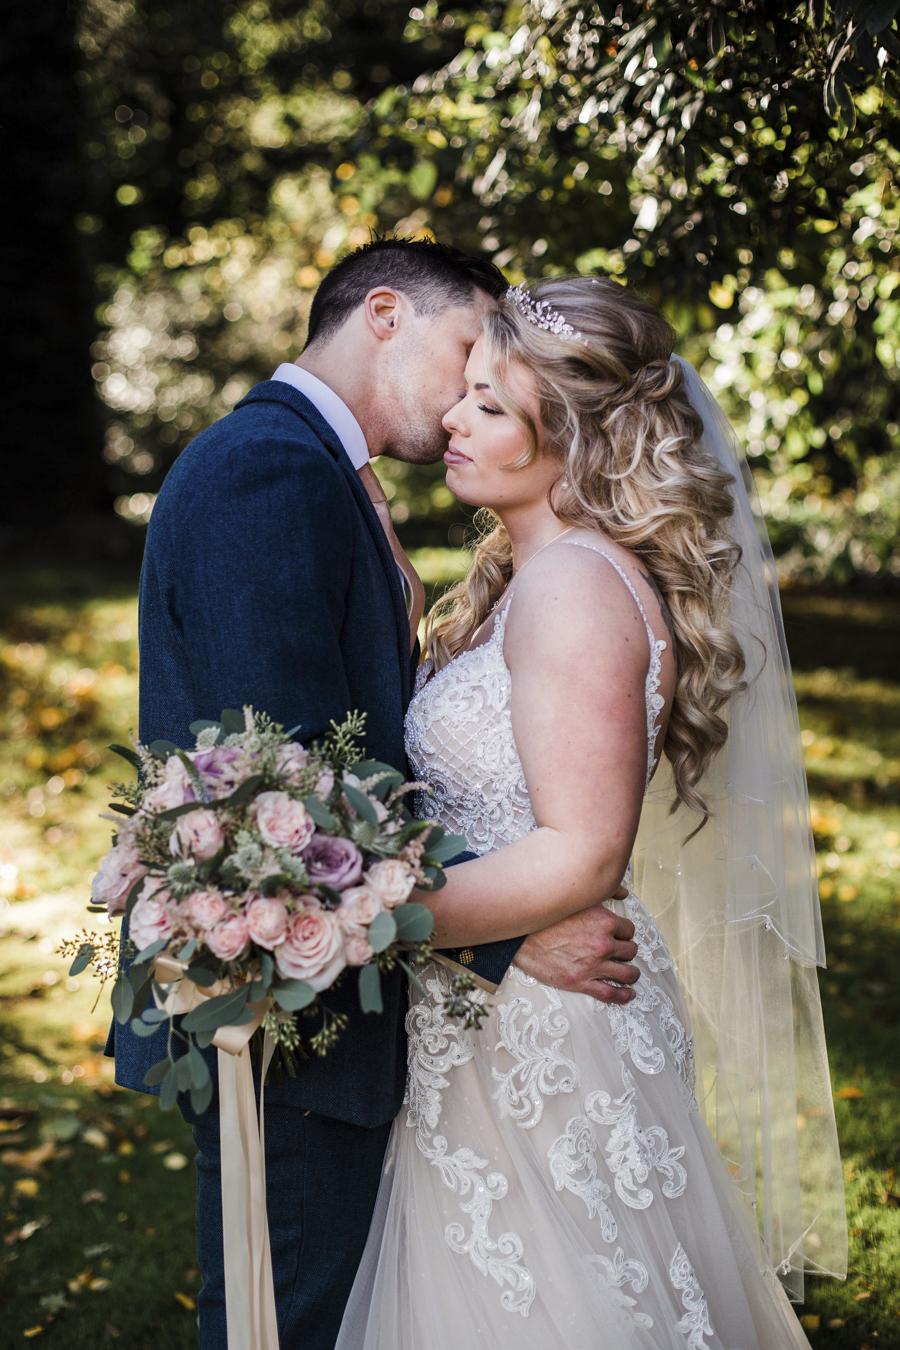 Rachel & Ben's beautiful Iscoyd Park wedding with Anna Beth Photography (31)